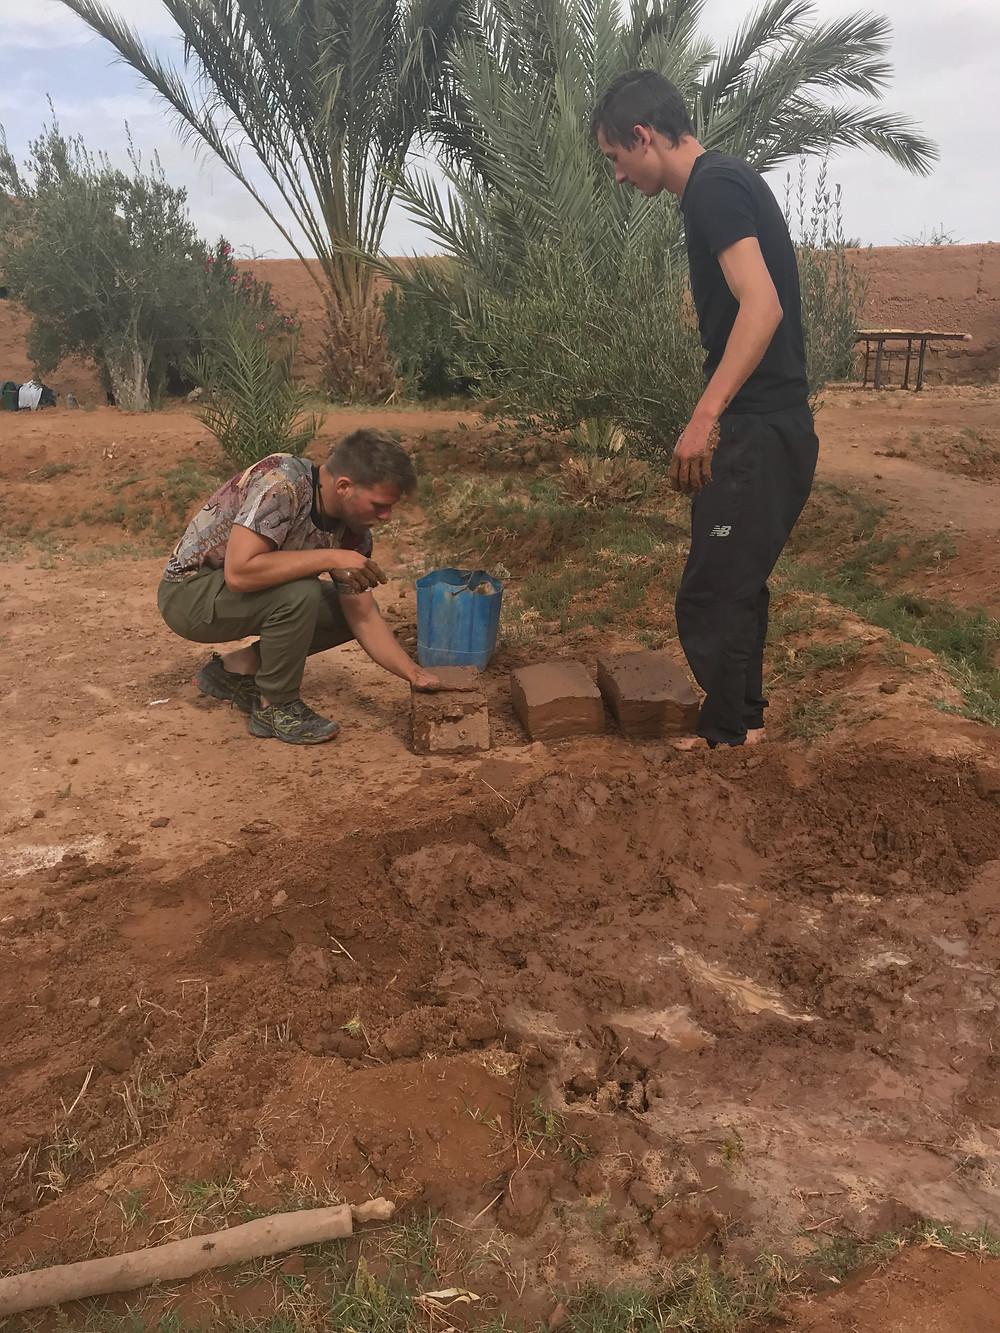 making mud bricks for natural building in desert